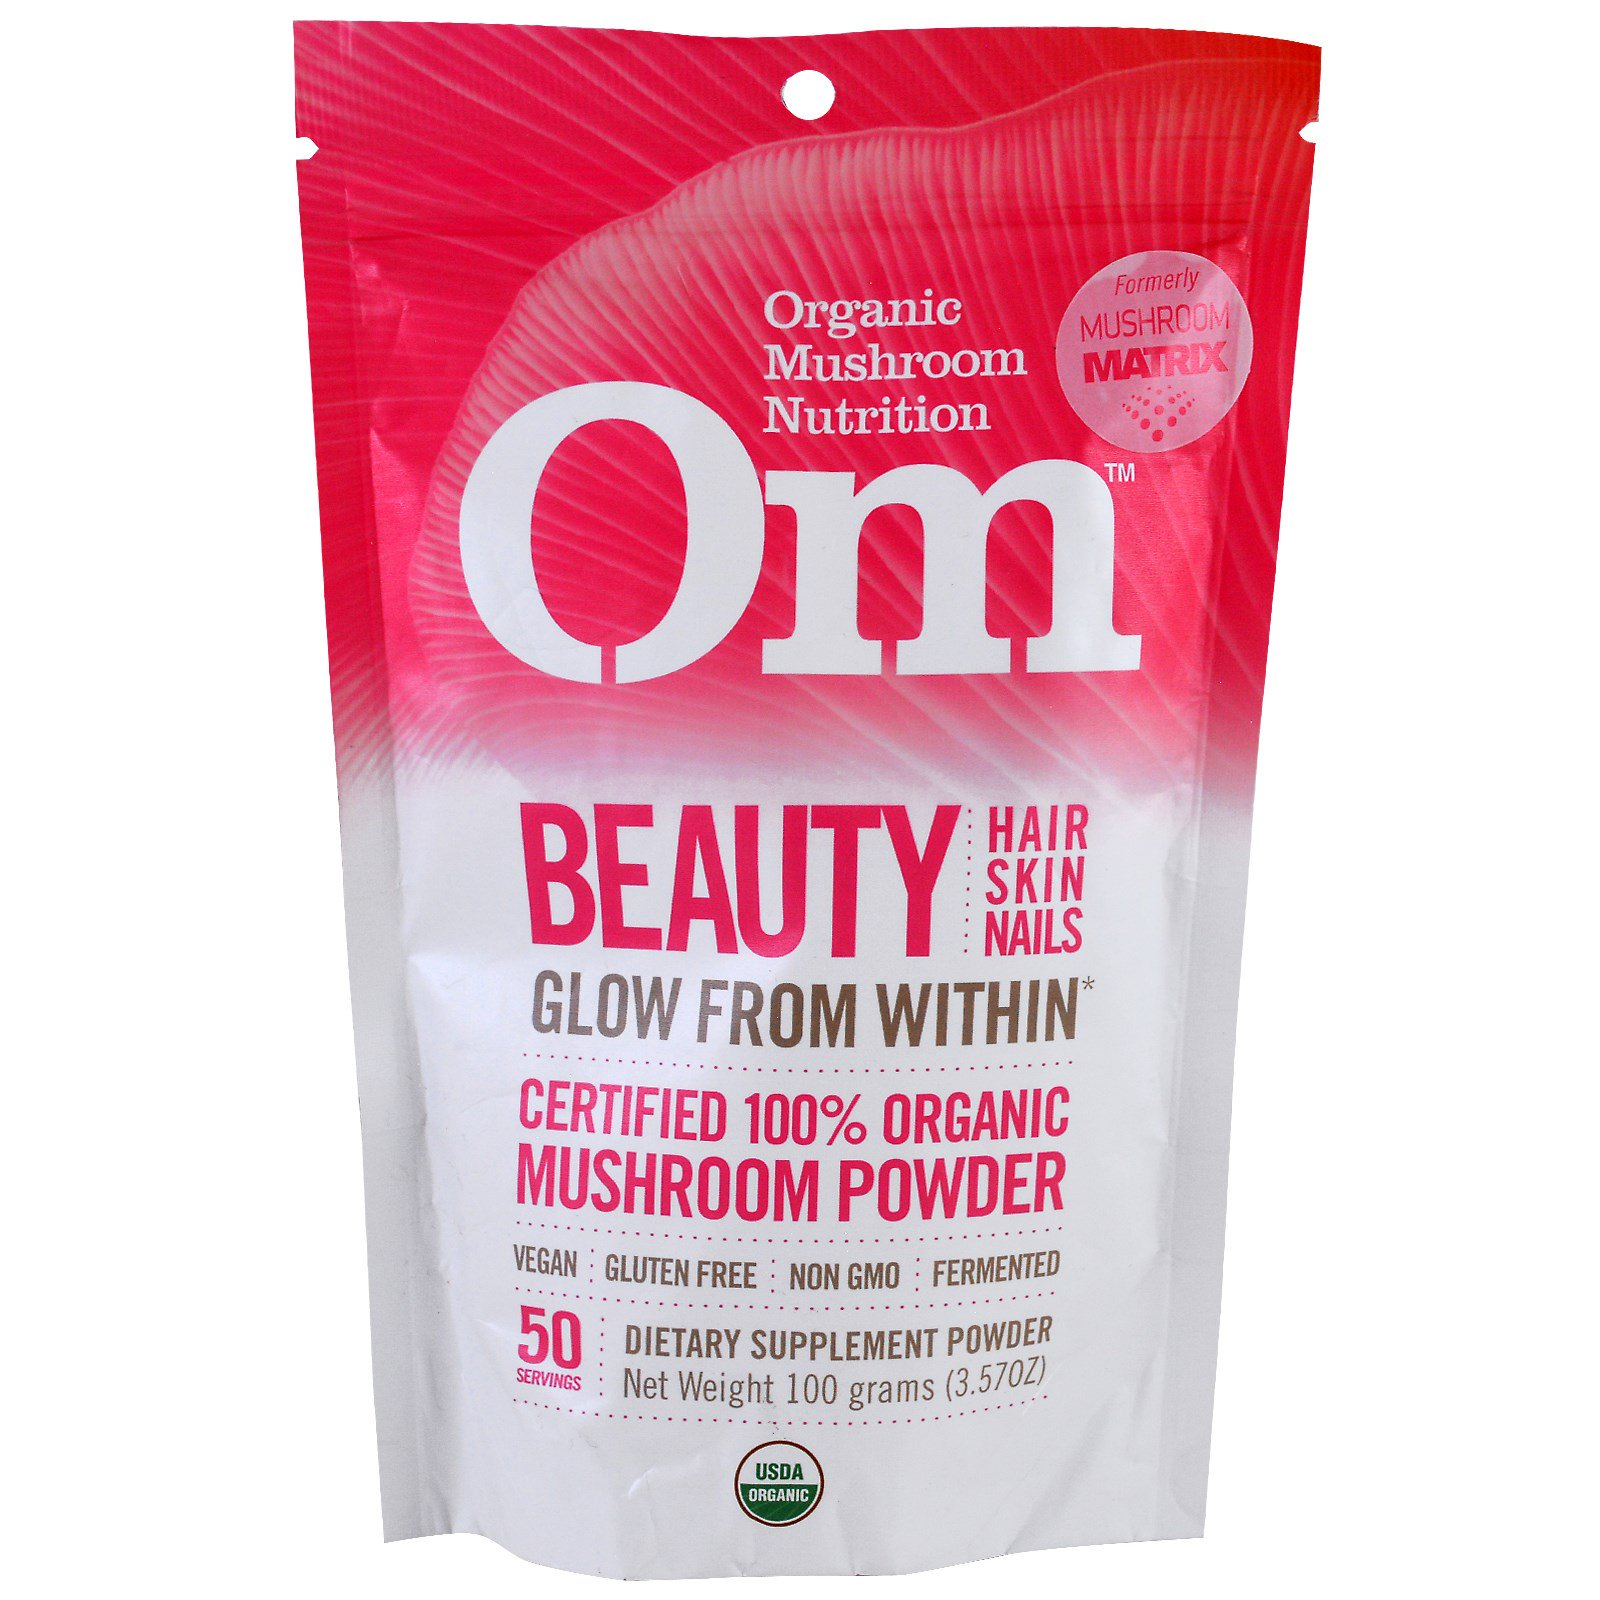 Organic Mushroom Nutrition, Красота, грибной порошок, 3.57 унций (100 г)